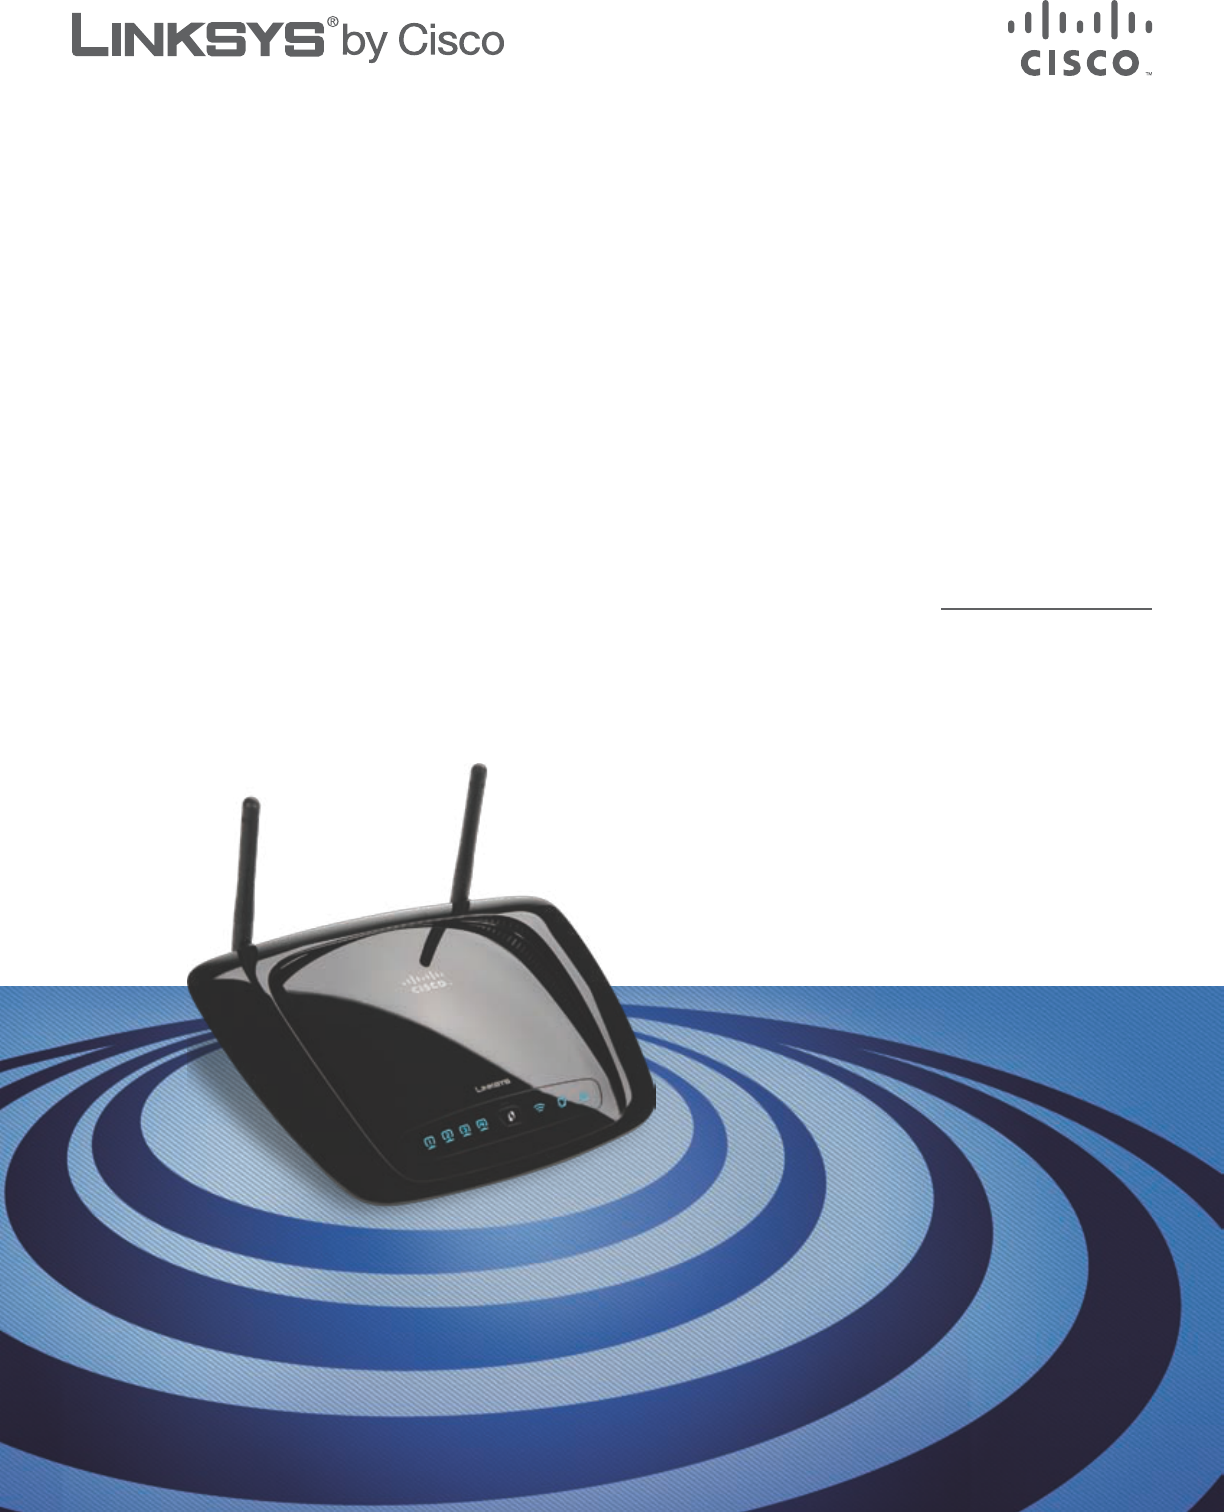 LINKSYS WRT160NL Wireless-N Broadband Router with Storage